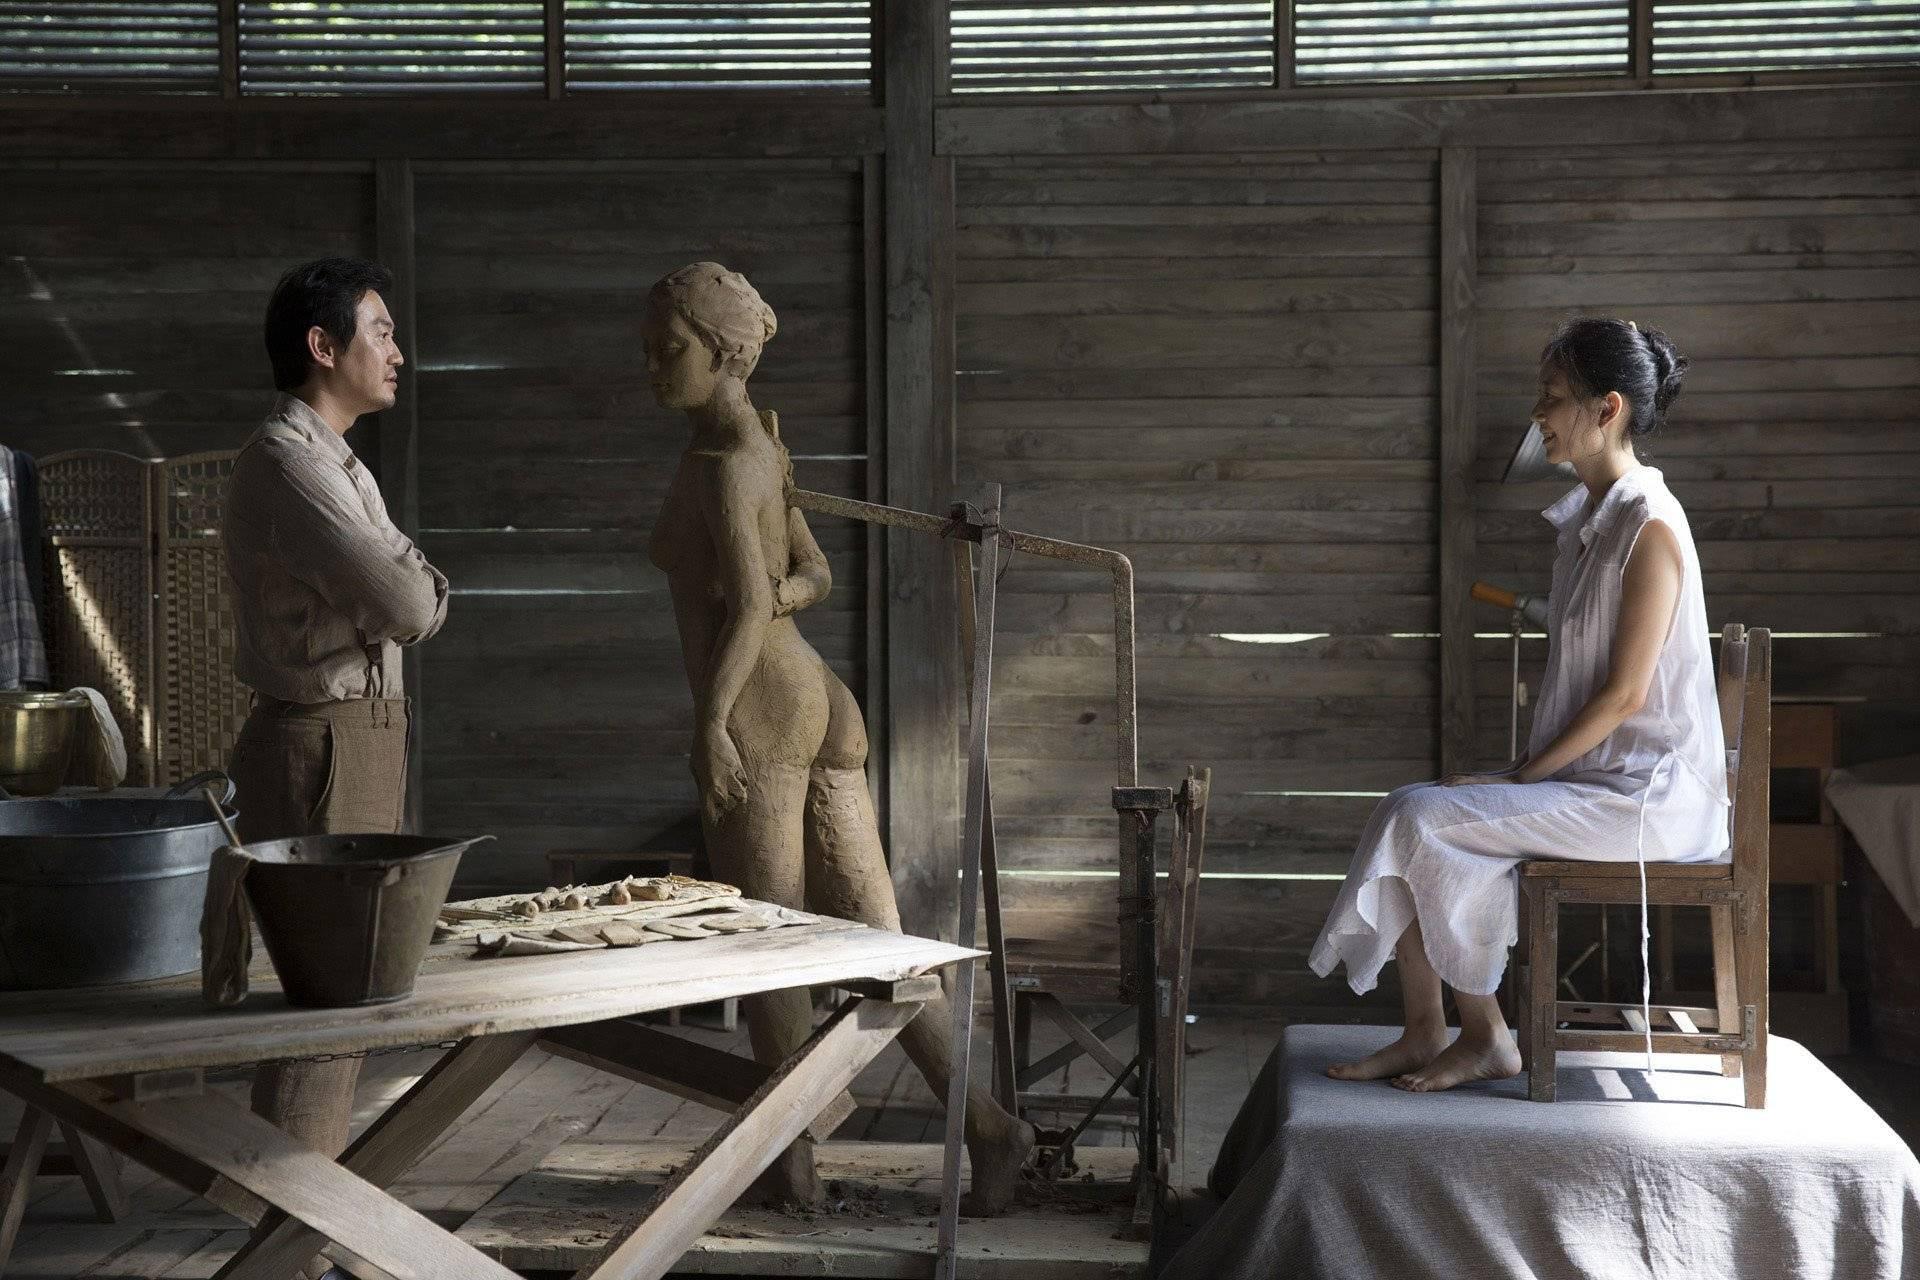 LA Italian Cultural Institute to screen Korean film Late Spring - The Korea Times